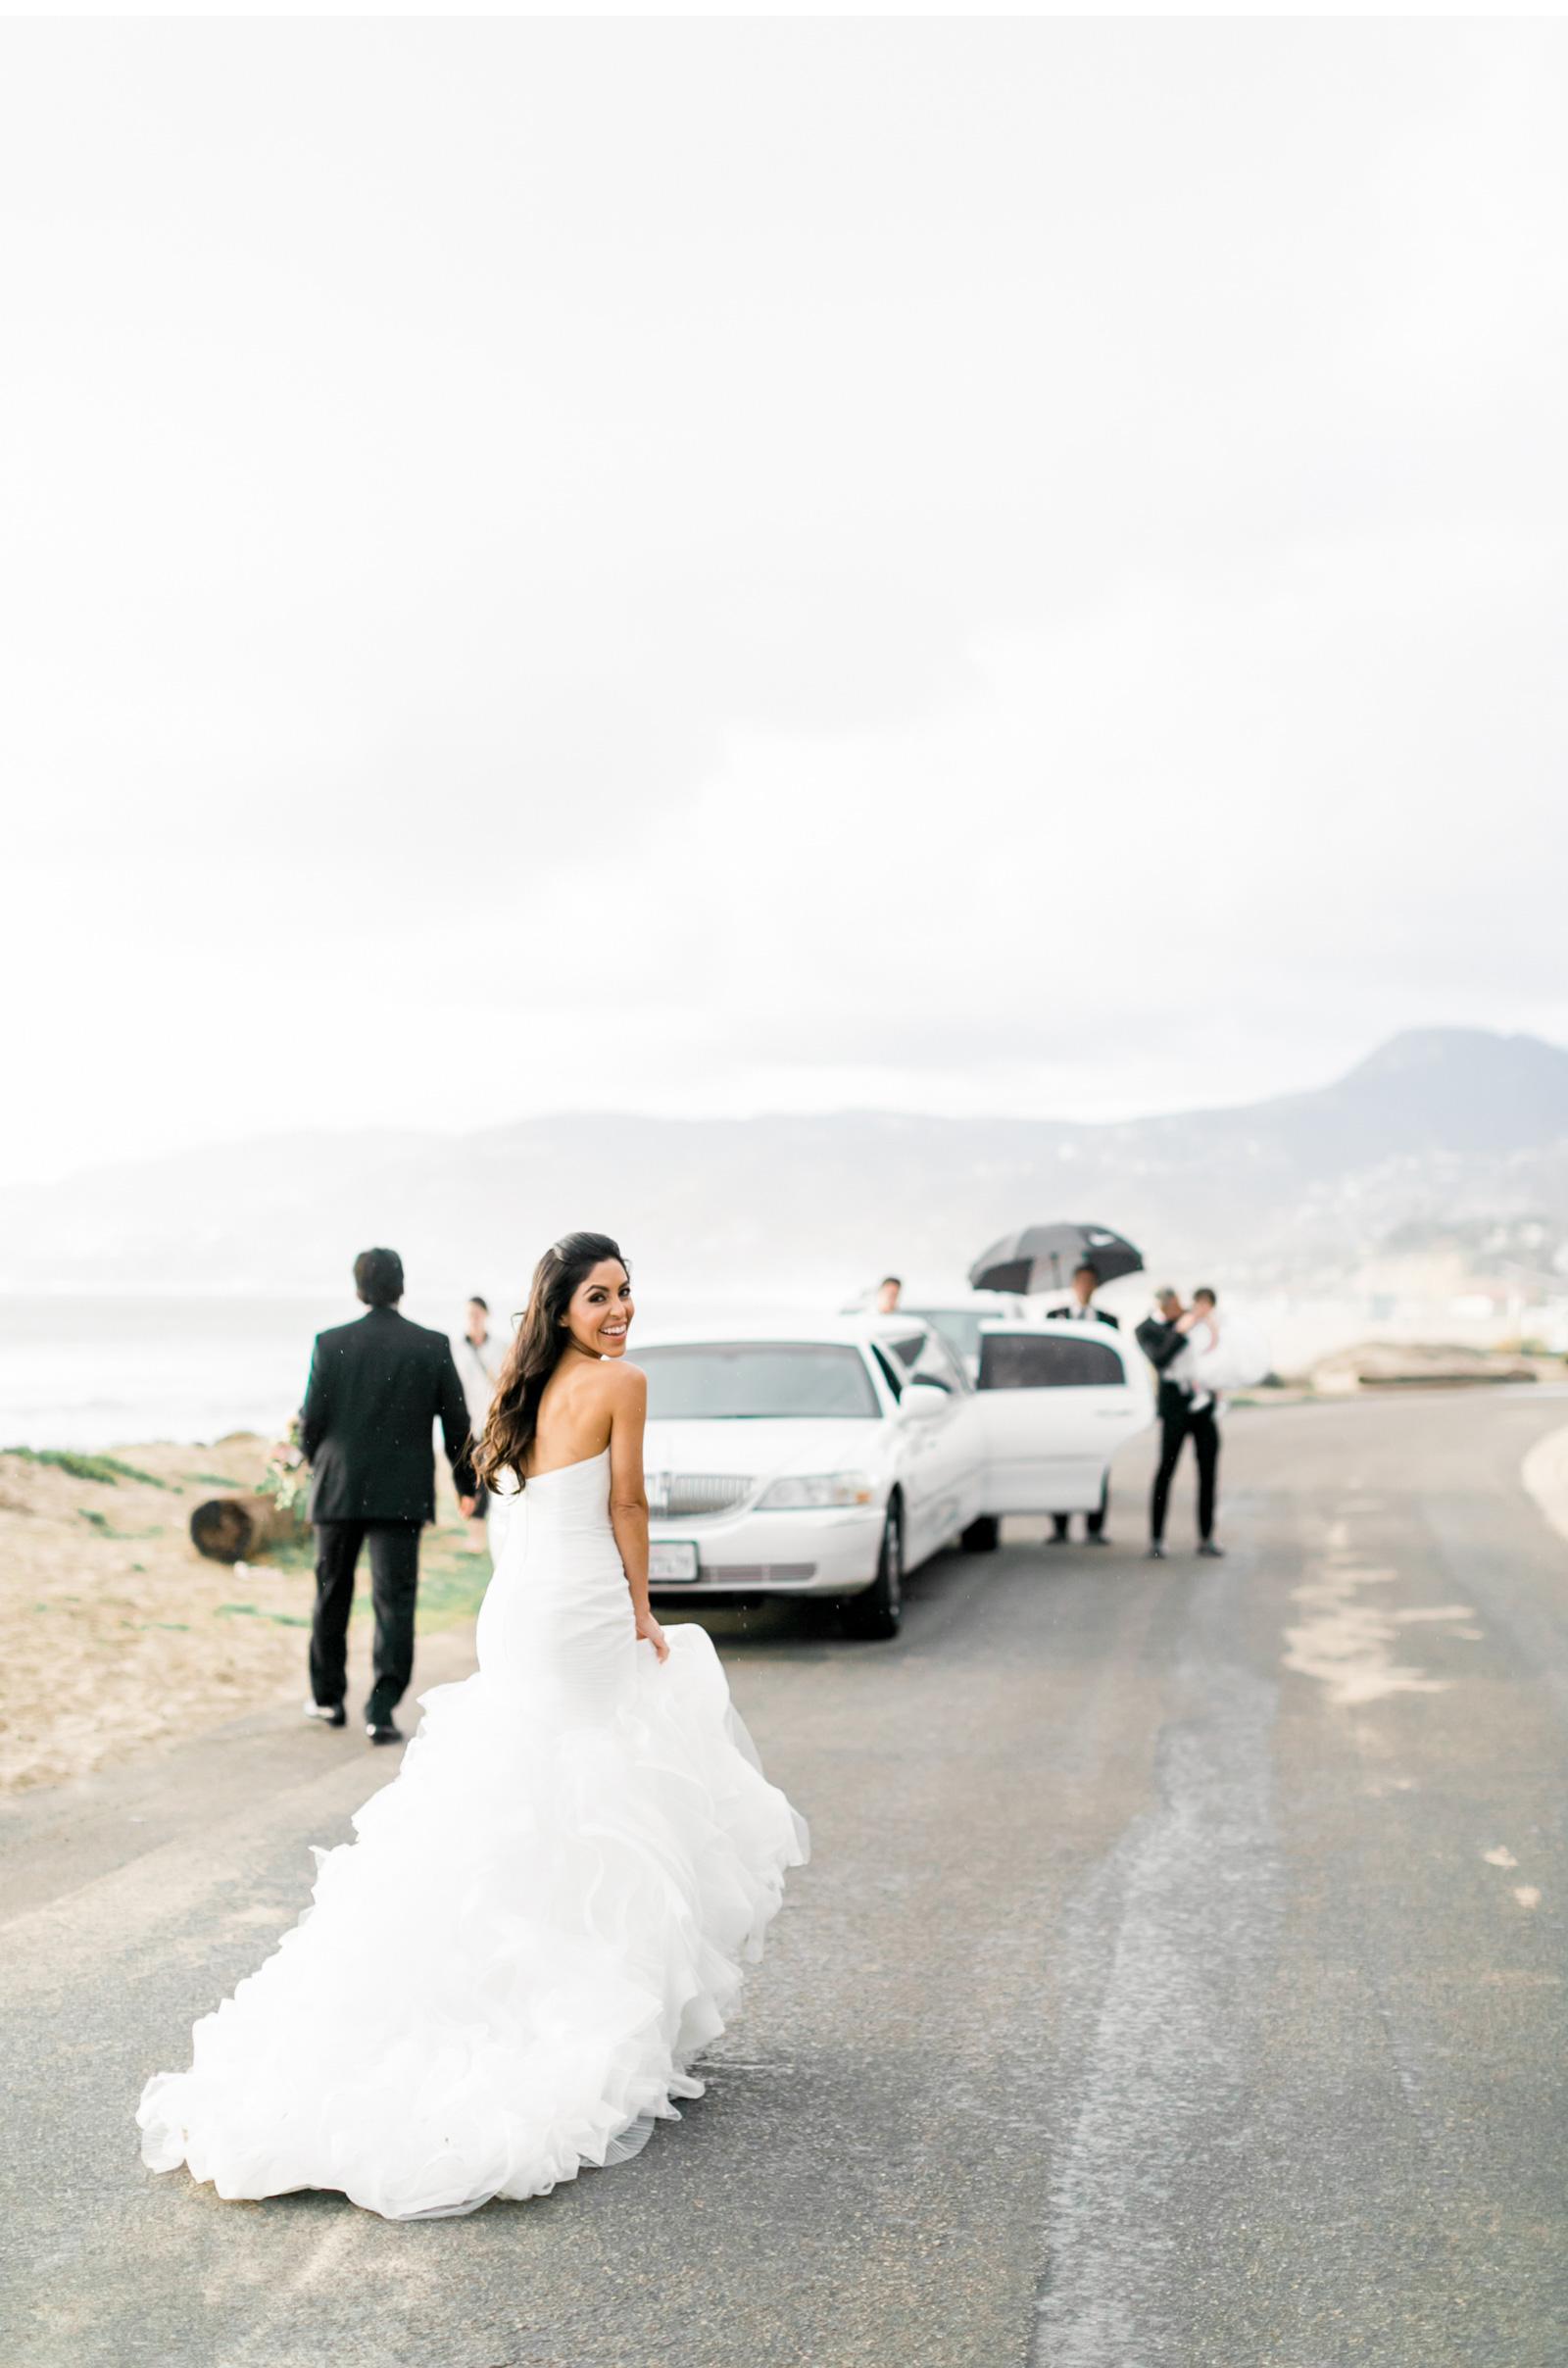 Sunset-Restaurant-Malibu-Beach-Wedding-Natalie-Schutt-Photography_05.jpg